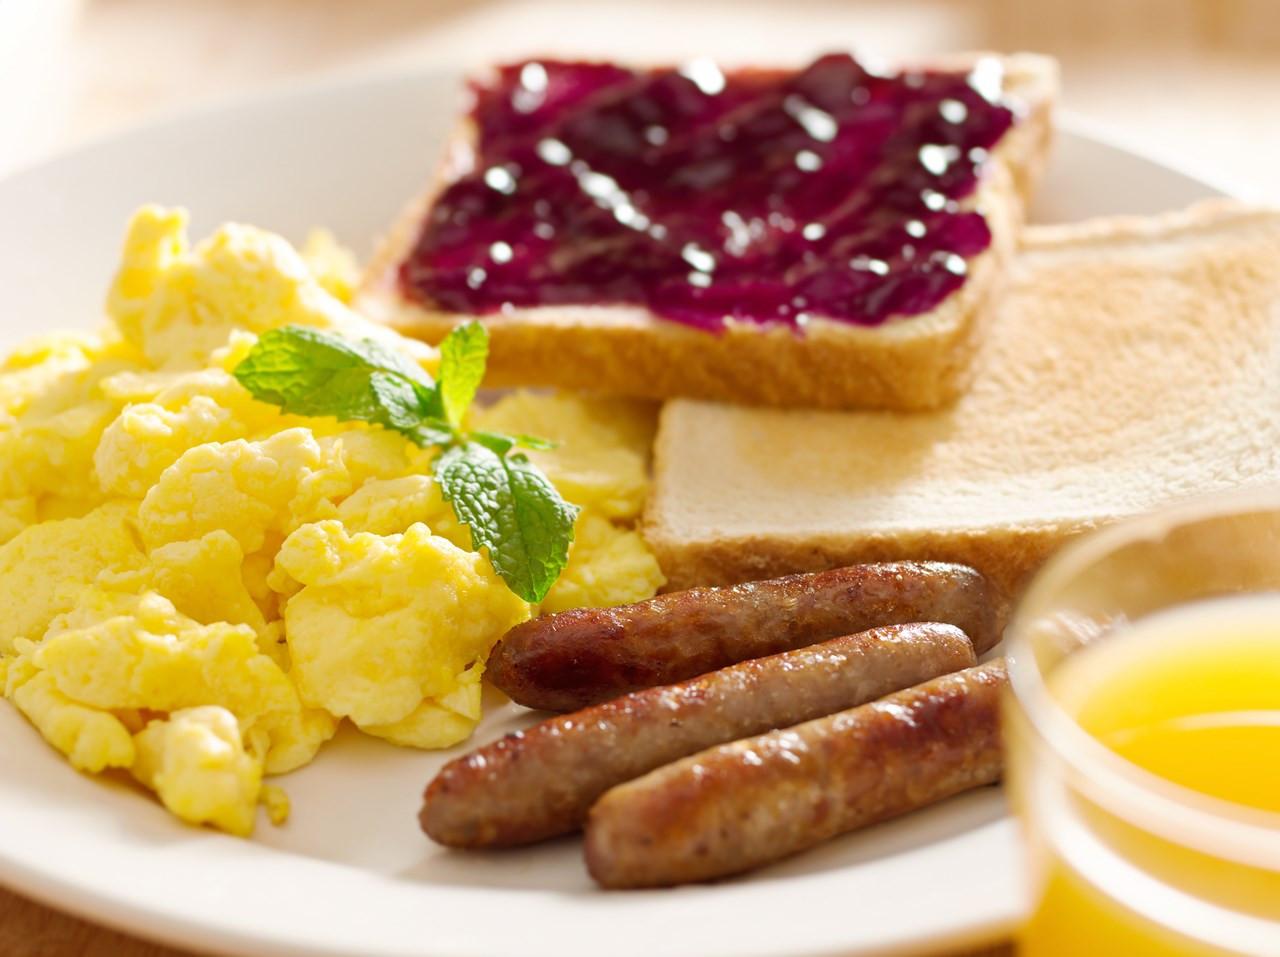 Healthy Breakfast On The Go To Buy  Maple Breakfast Sausage Links 12 pk Buy online at best